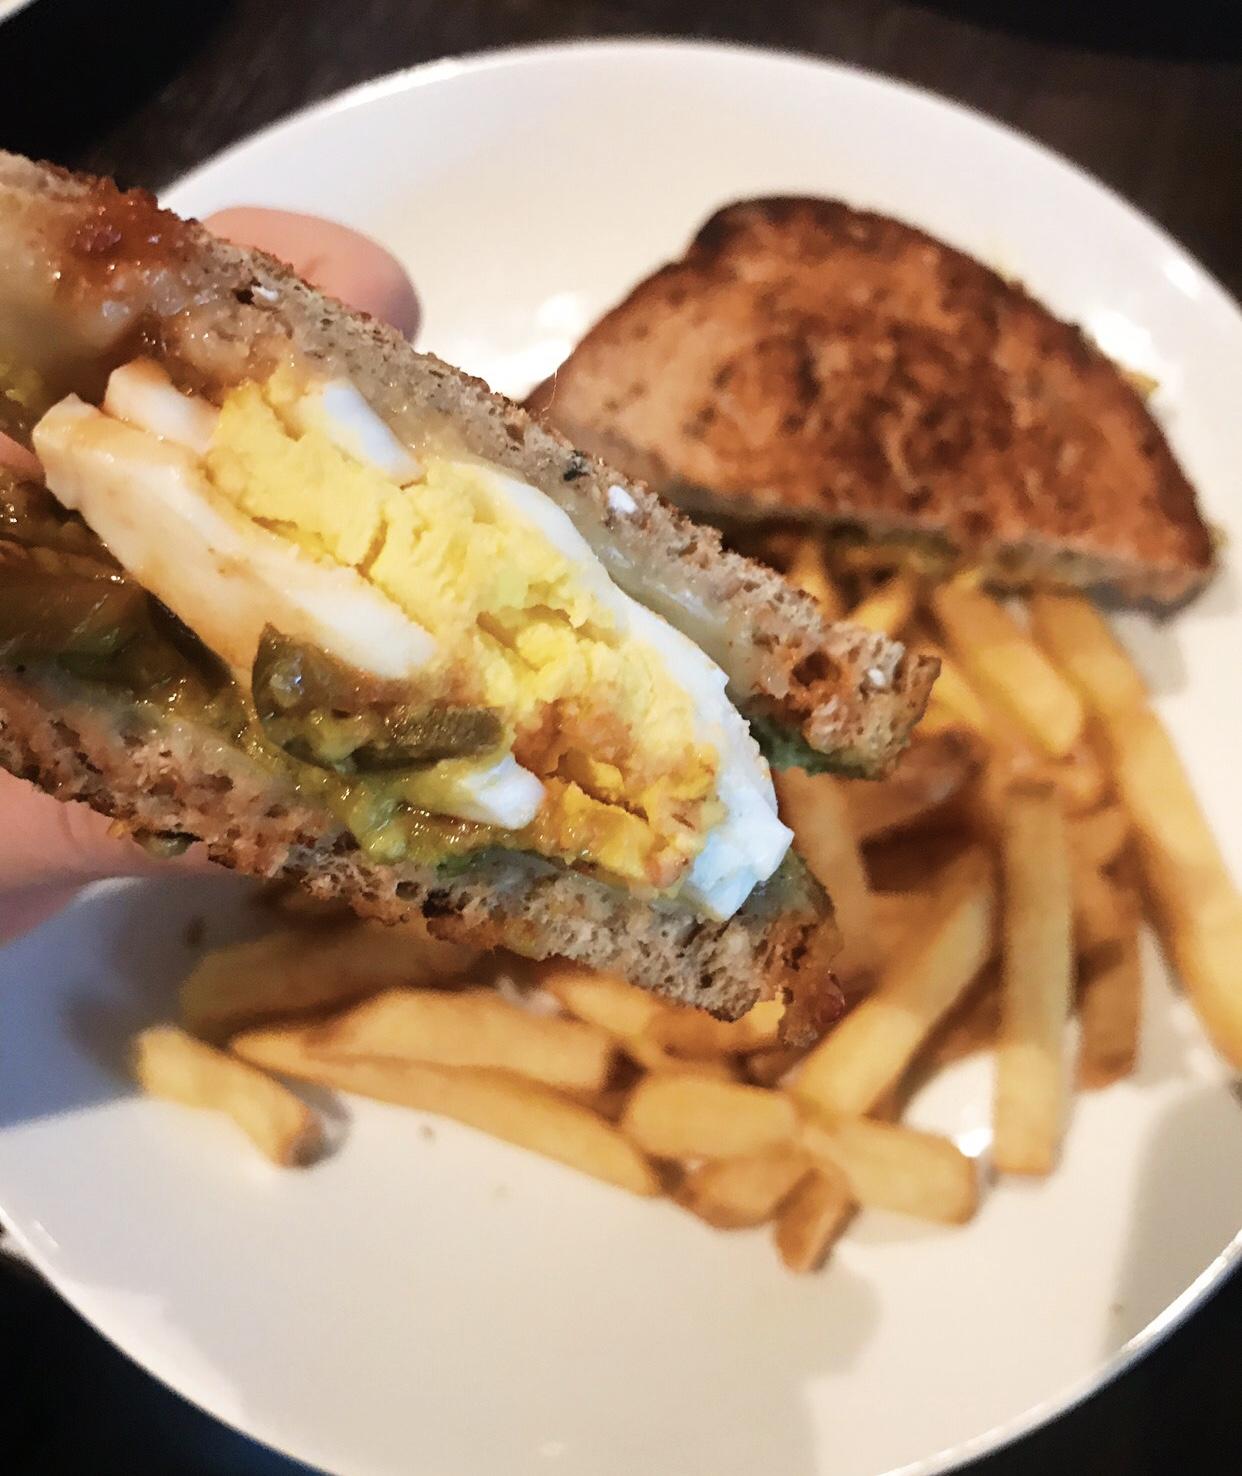 Spicy Avocado & Chopped Egg Sandwich